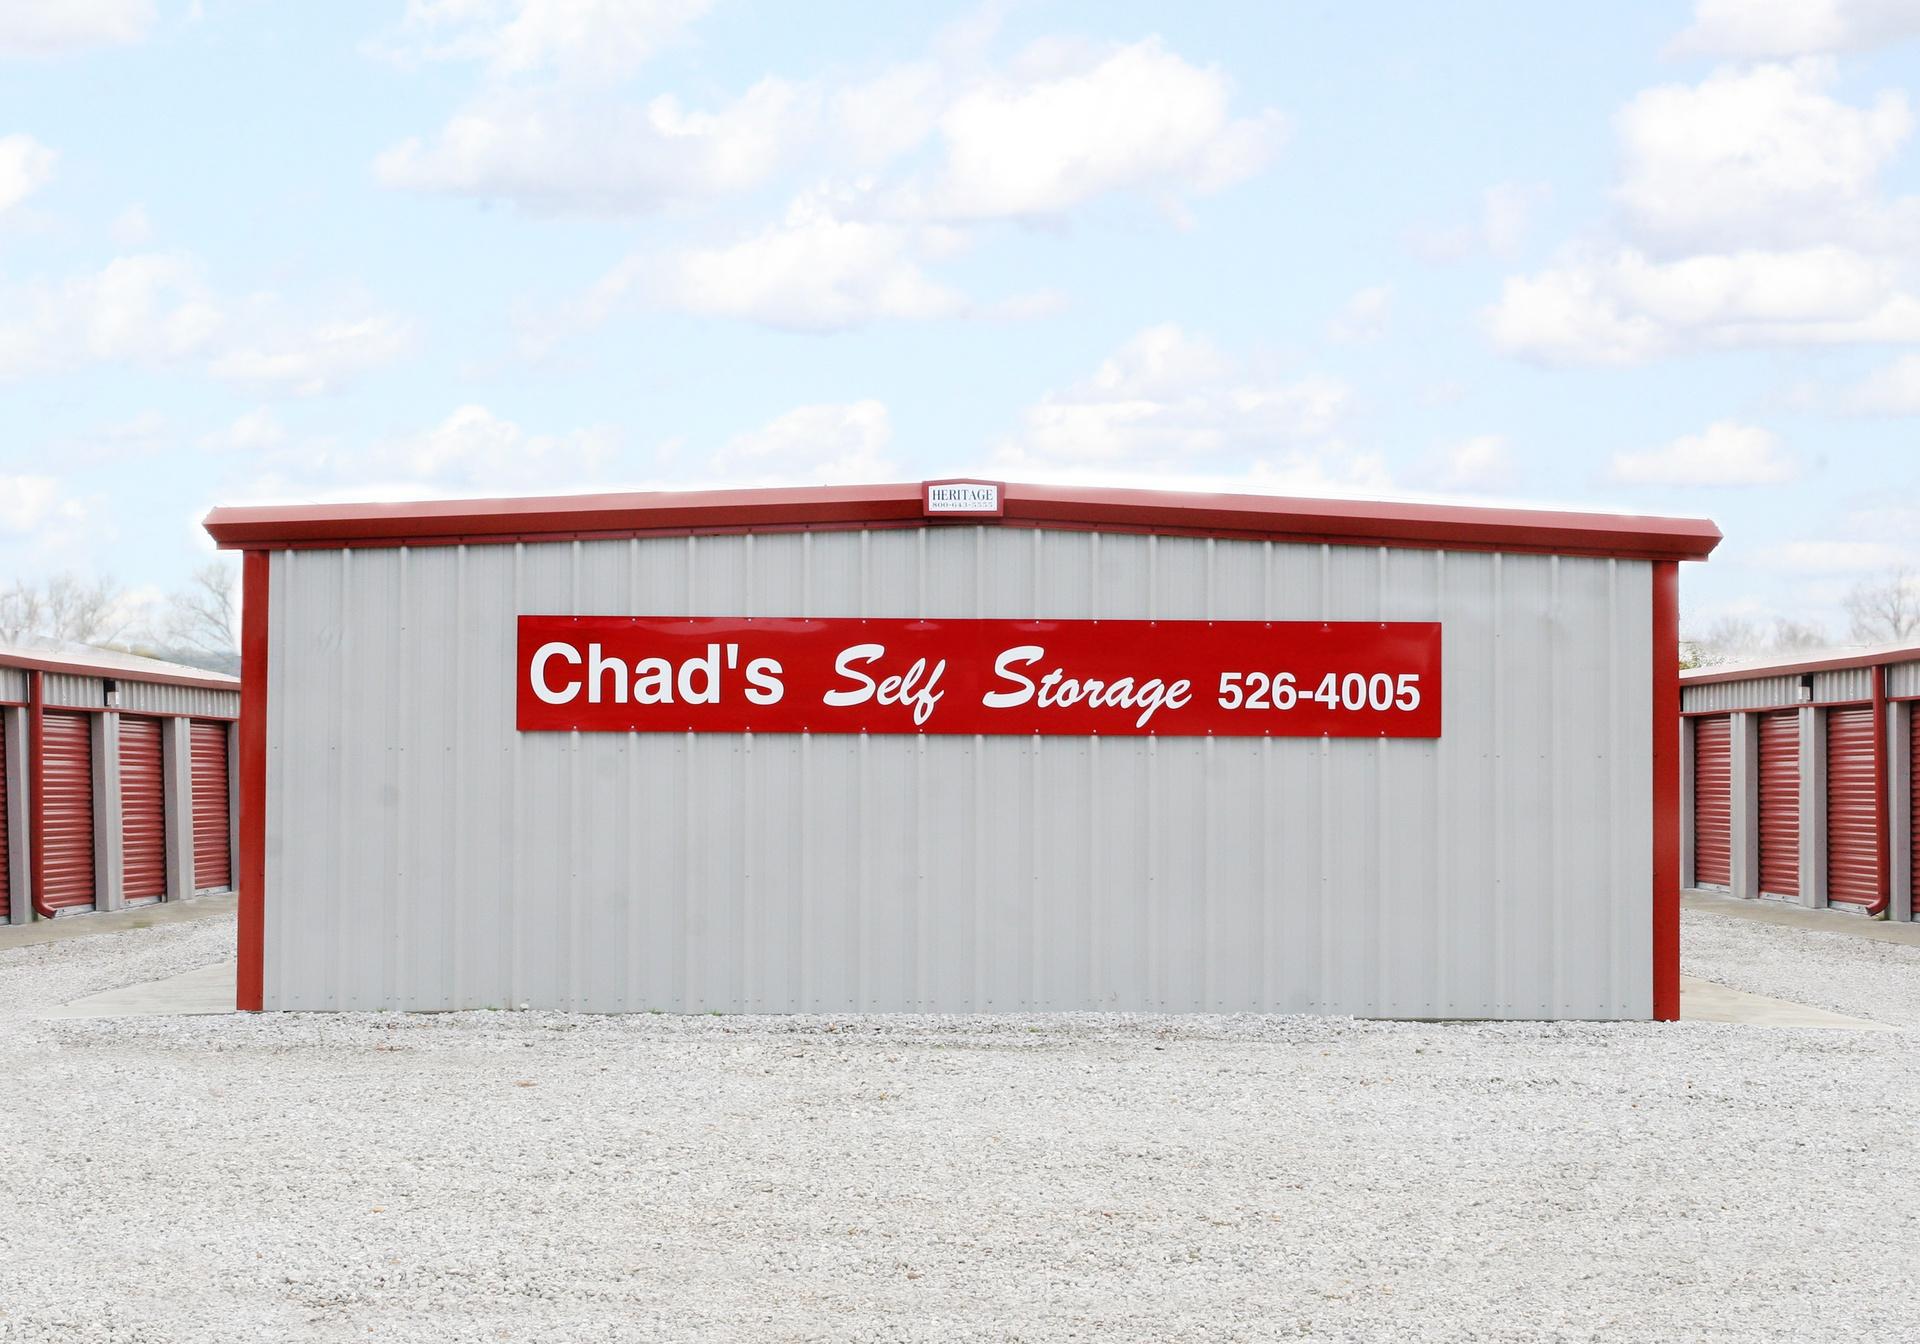 Chad's Body Shop & Wrecker Service